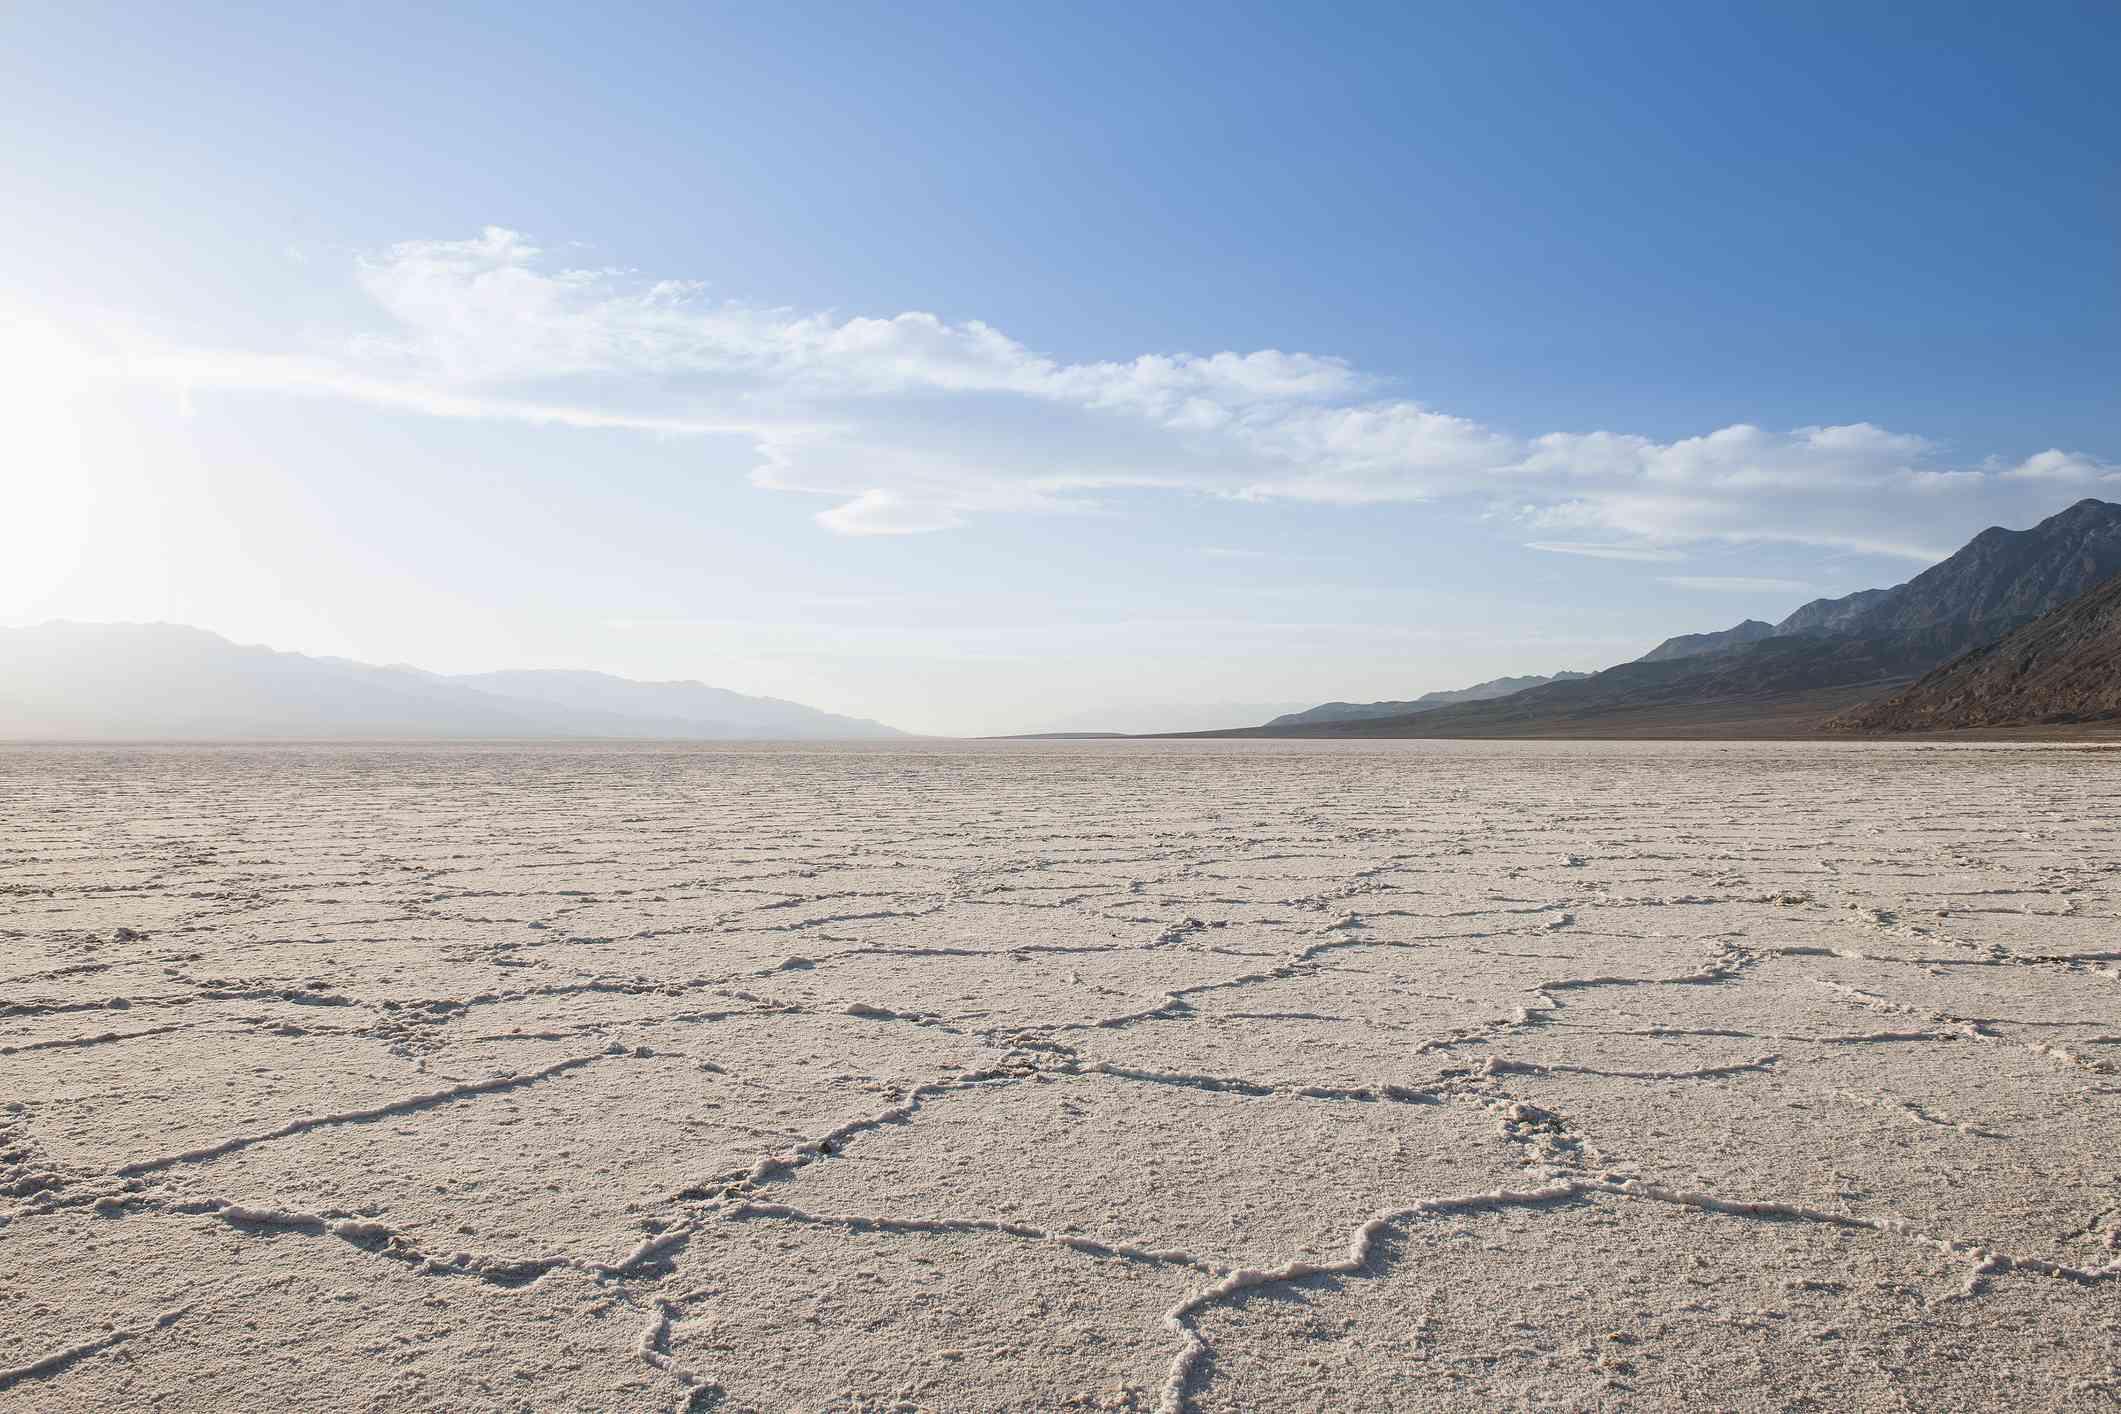 Cracks in dry desert landscape of Death Valley, California